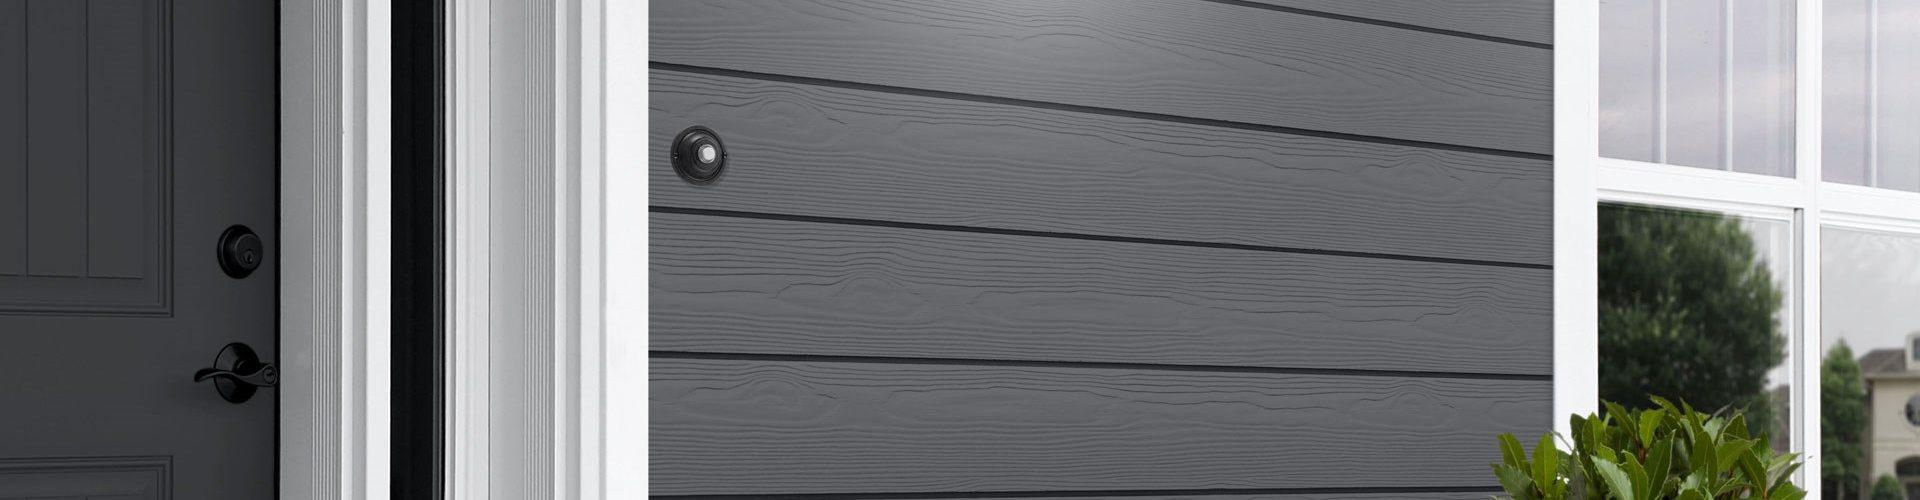 Cedral Click C18 Öine ookean - kiudtsement voodrilaud - puitu immiteeriv